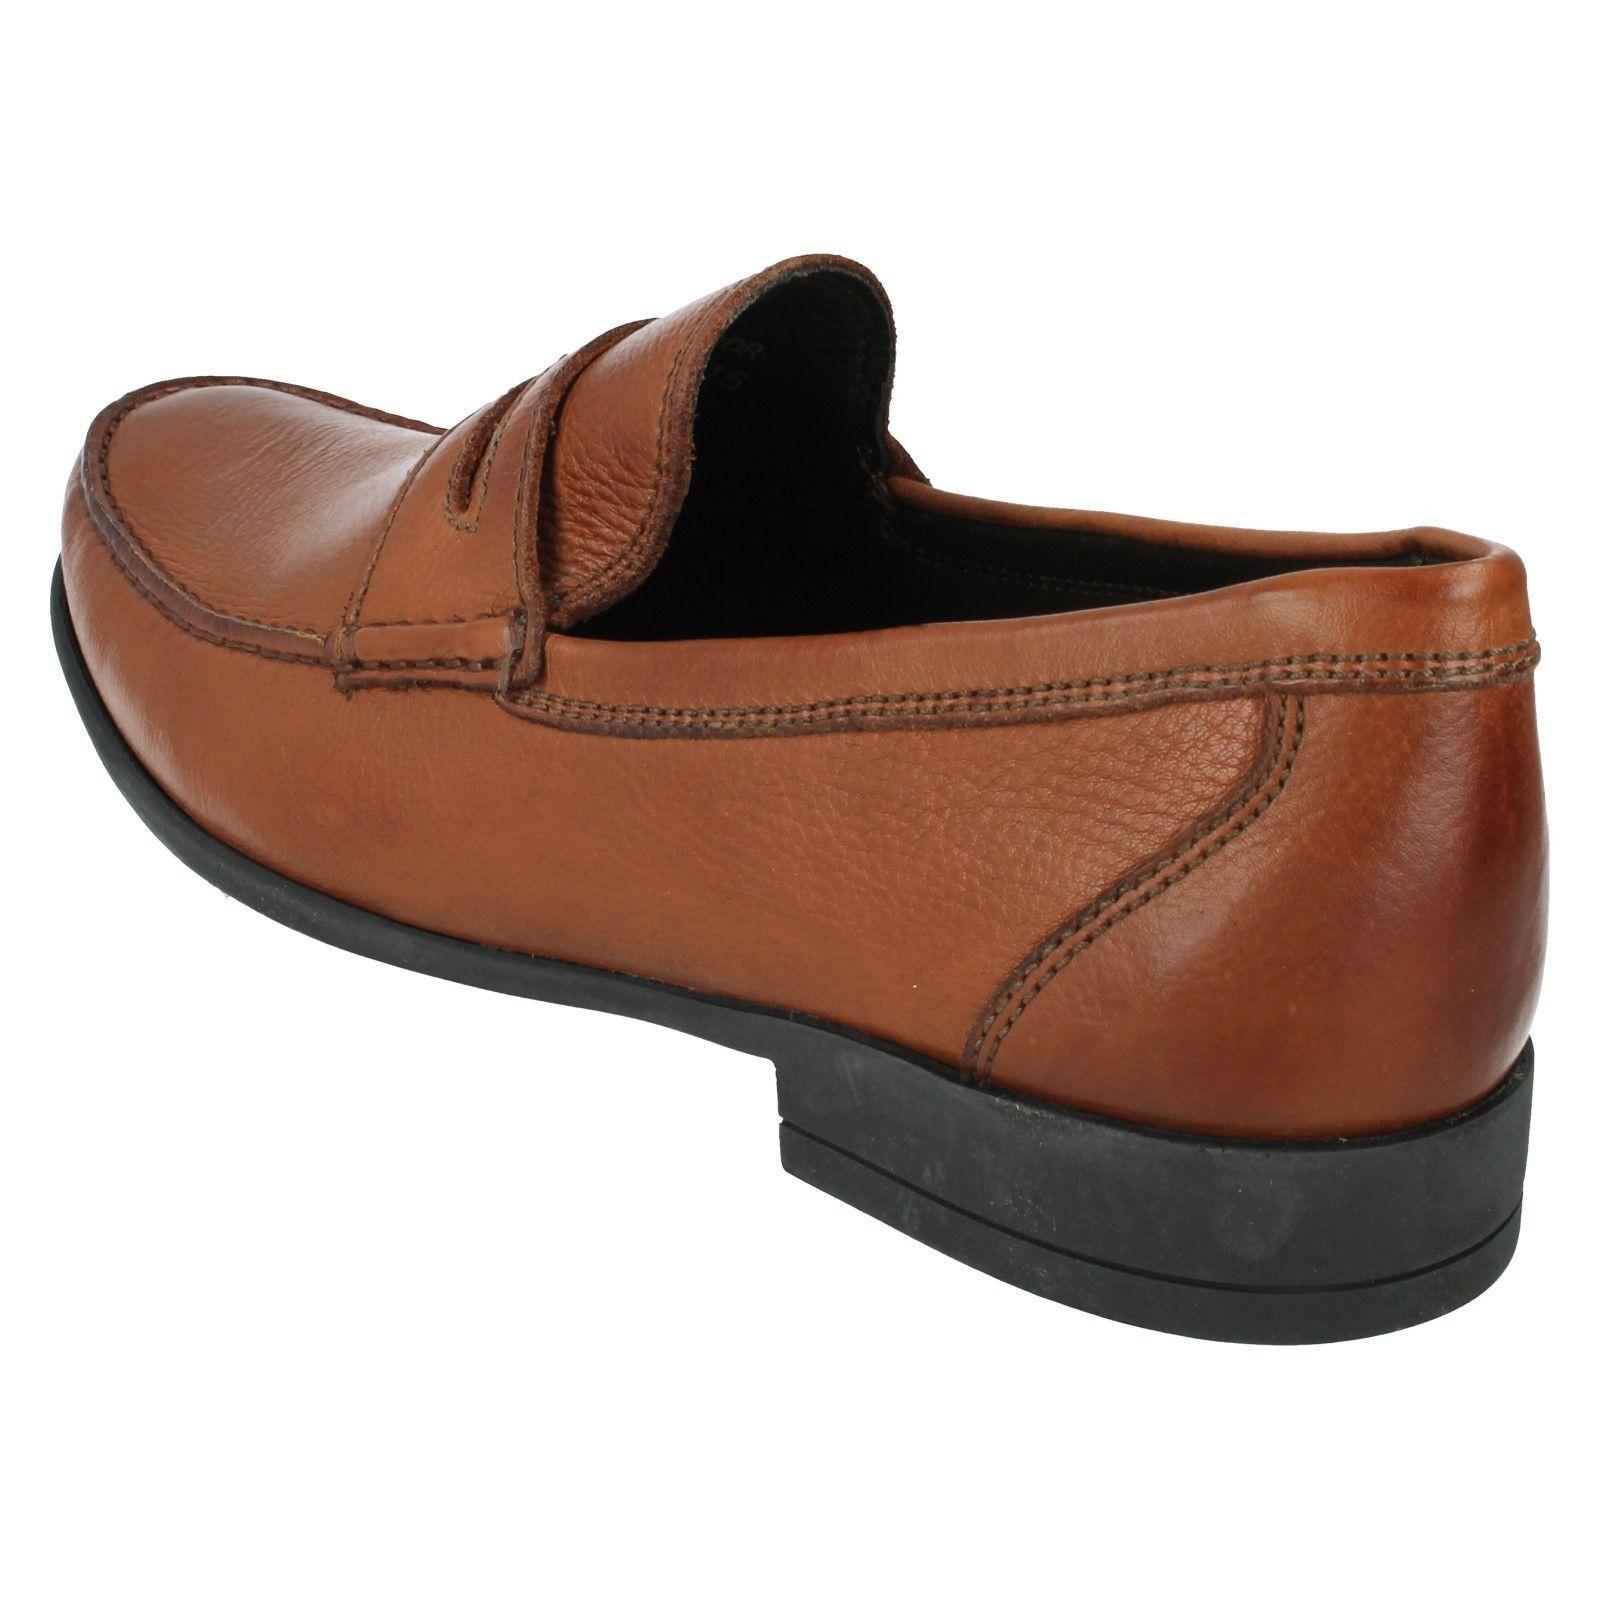 Uomo CASTELO slip Tan Leder Loafer Moccasin slip CASTELO on shoe By anatomic 4069f4